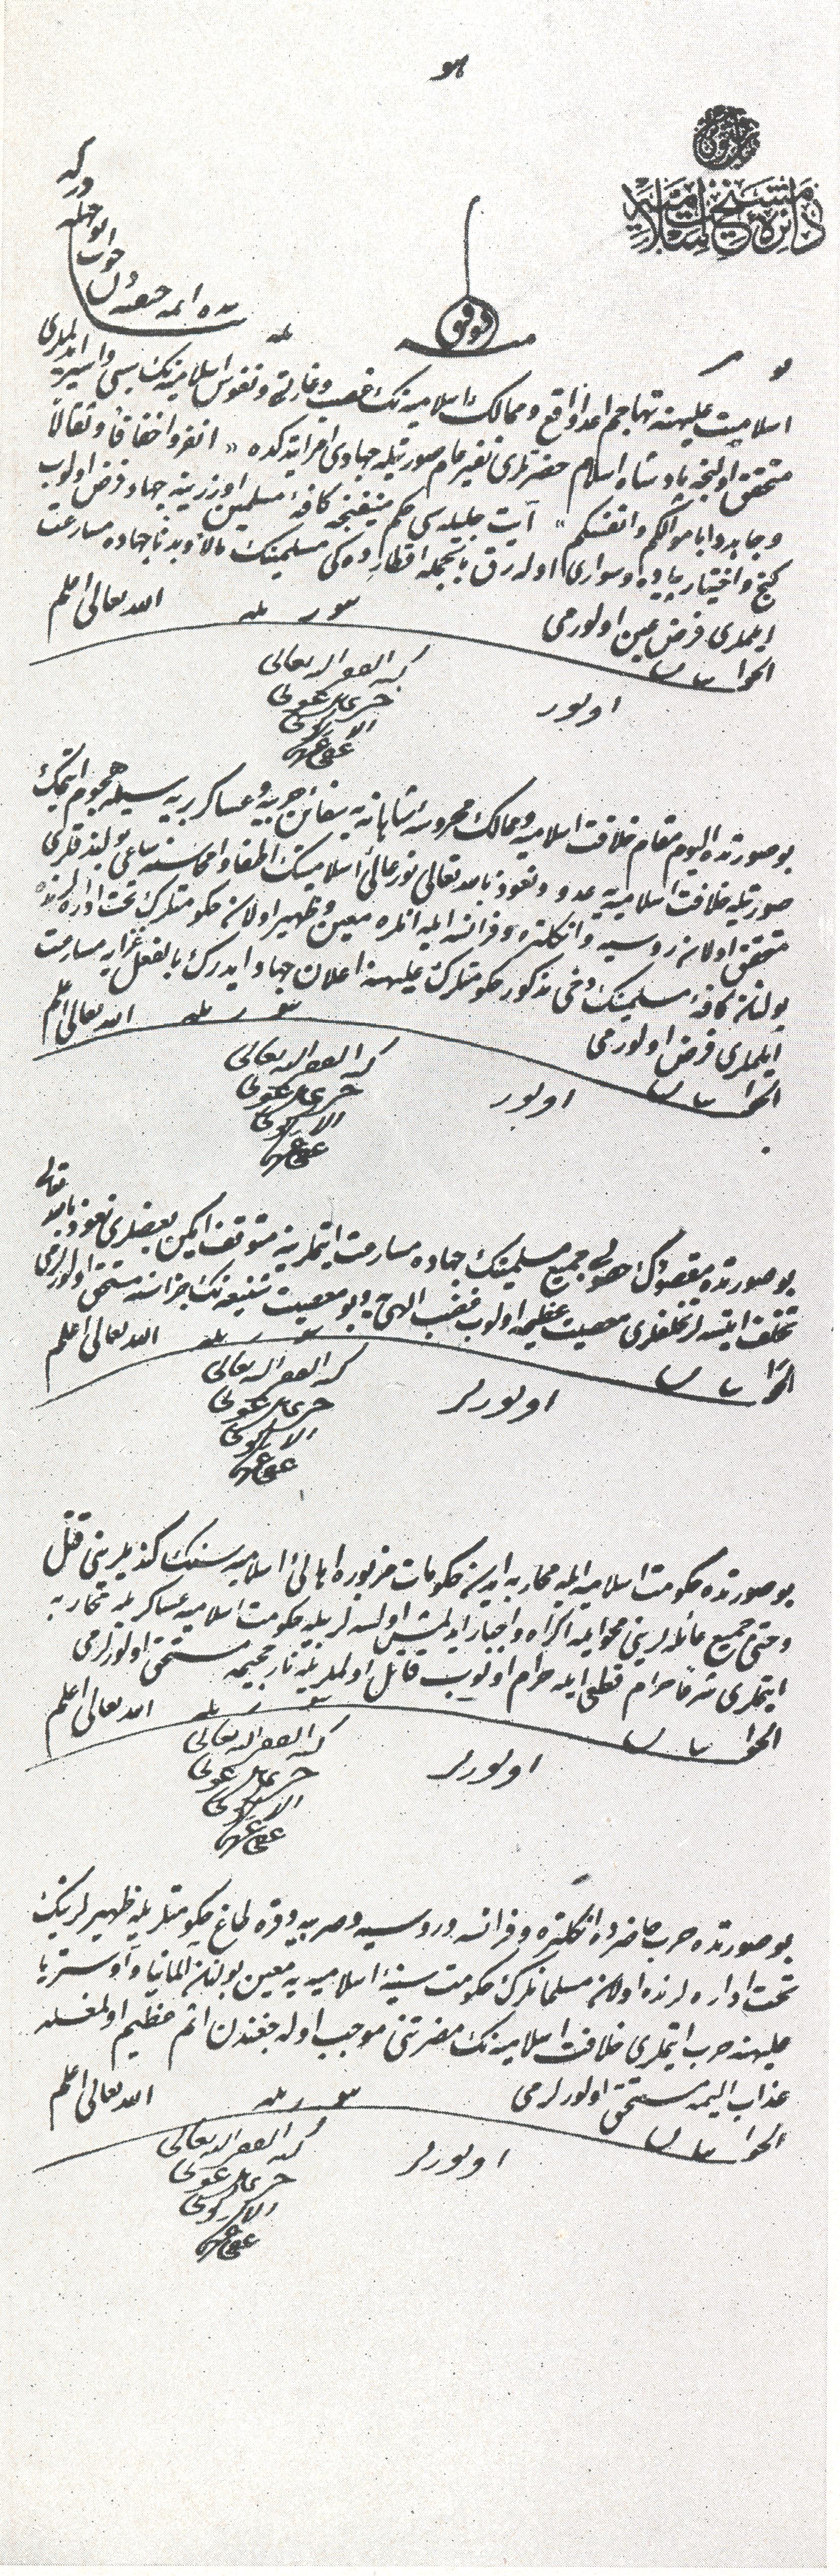 http://www.genocide-museum.am/arm/news-img/Jihad14-03.jpg